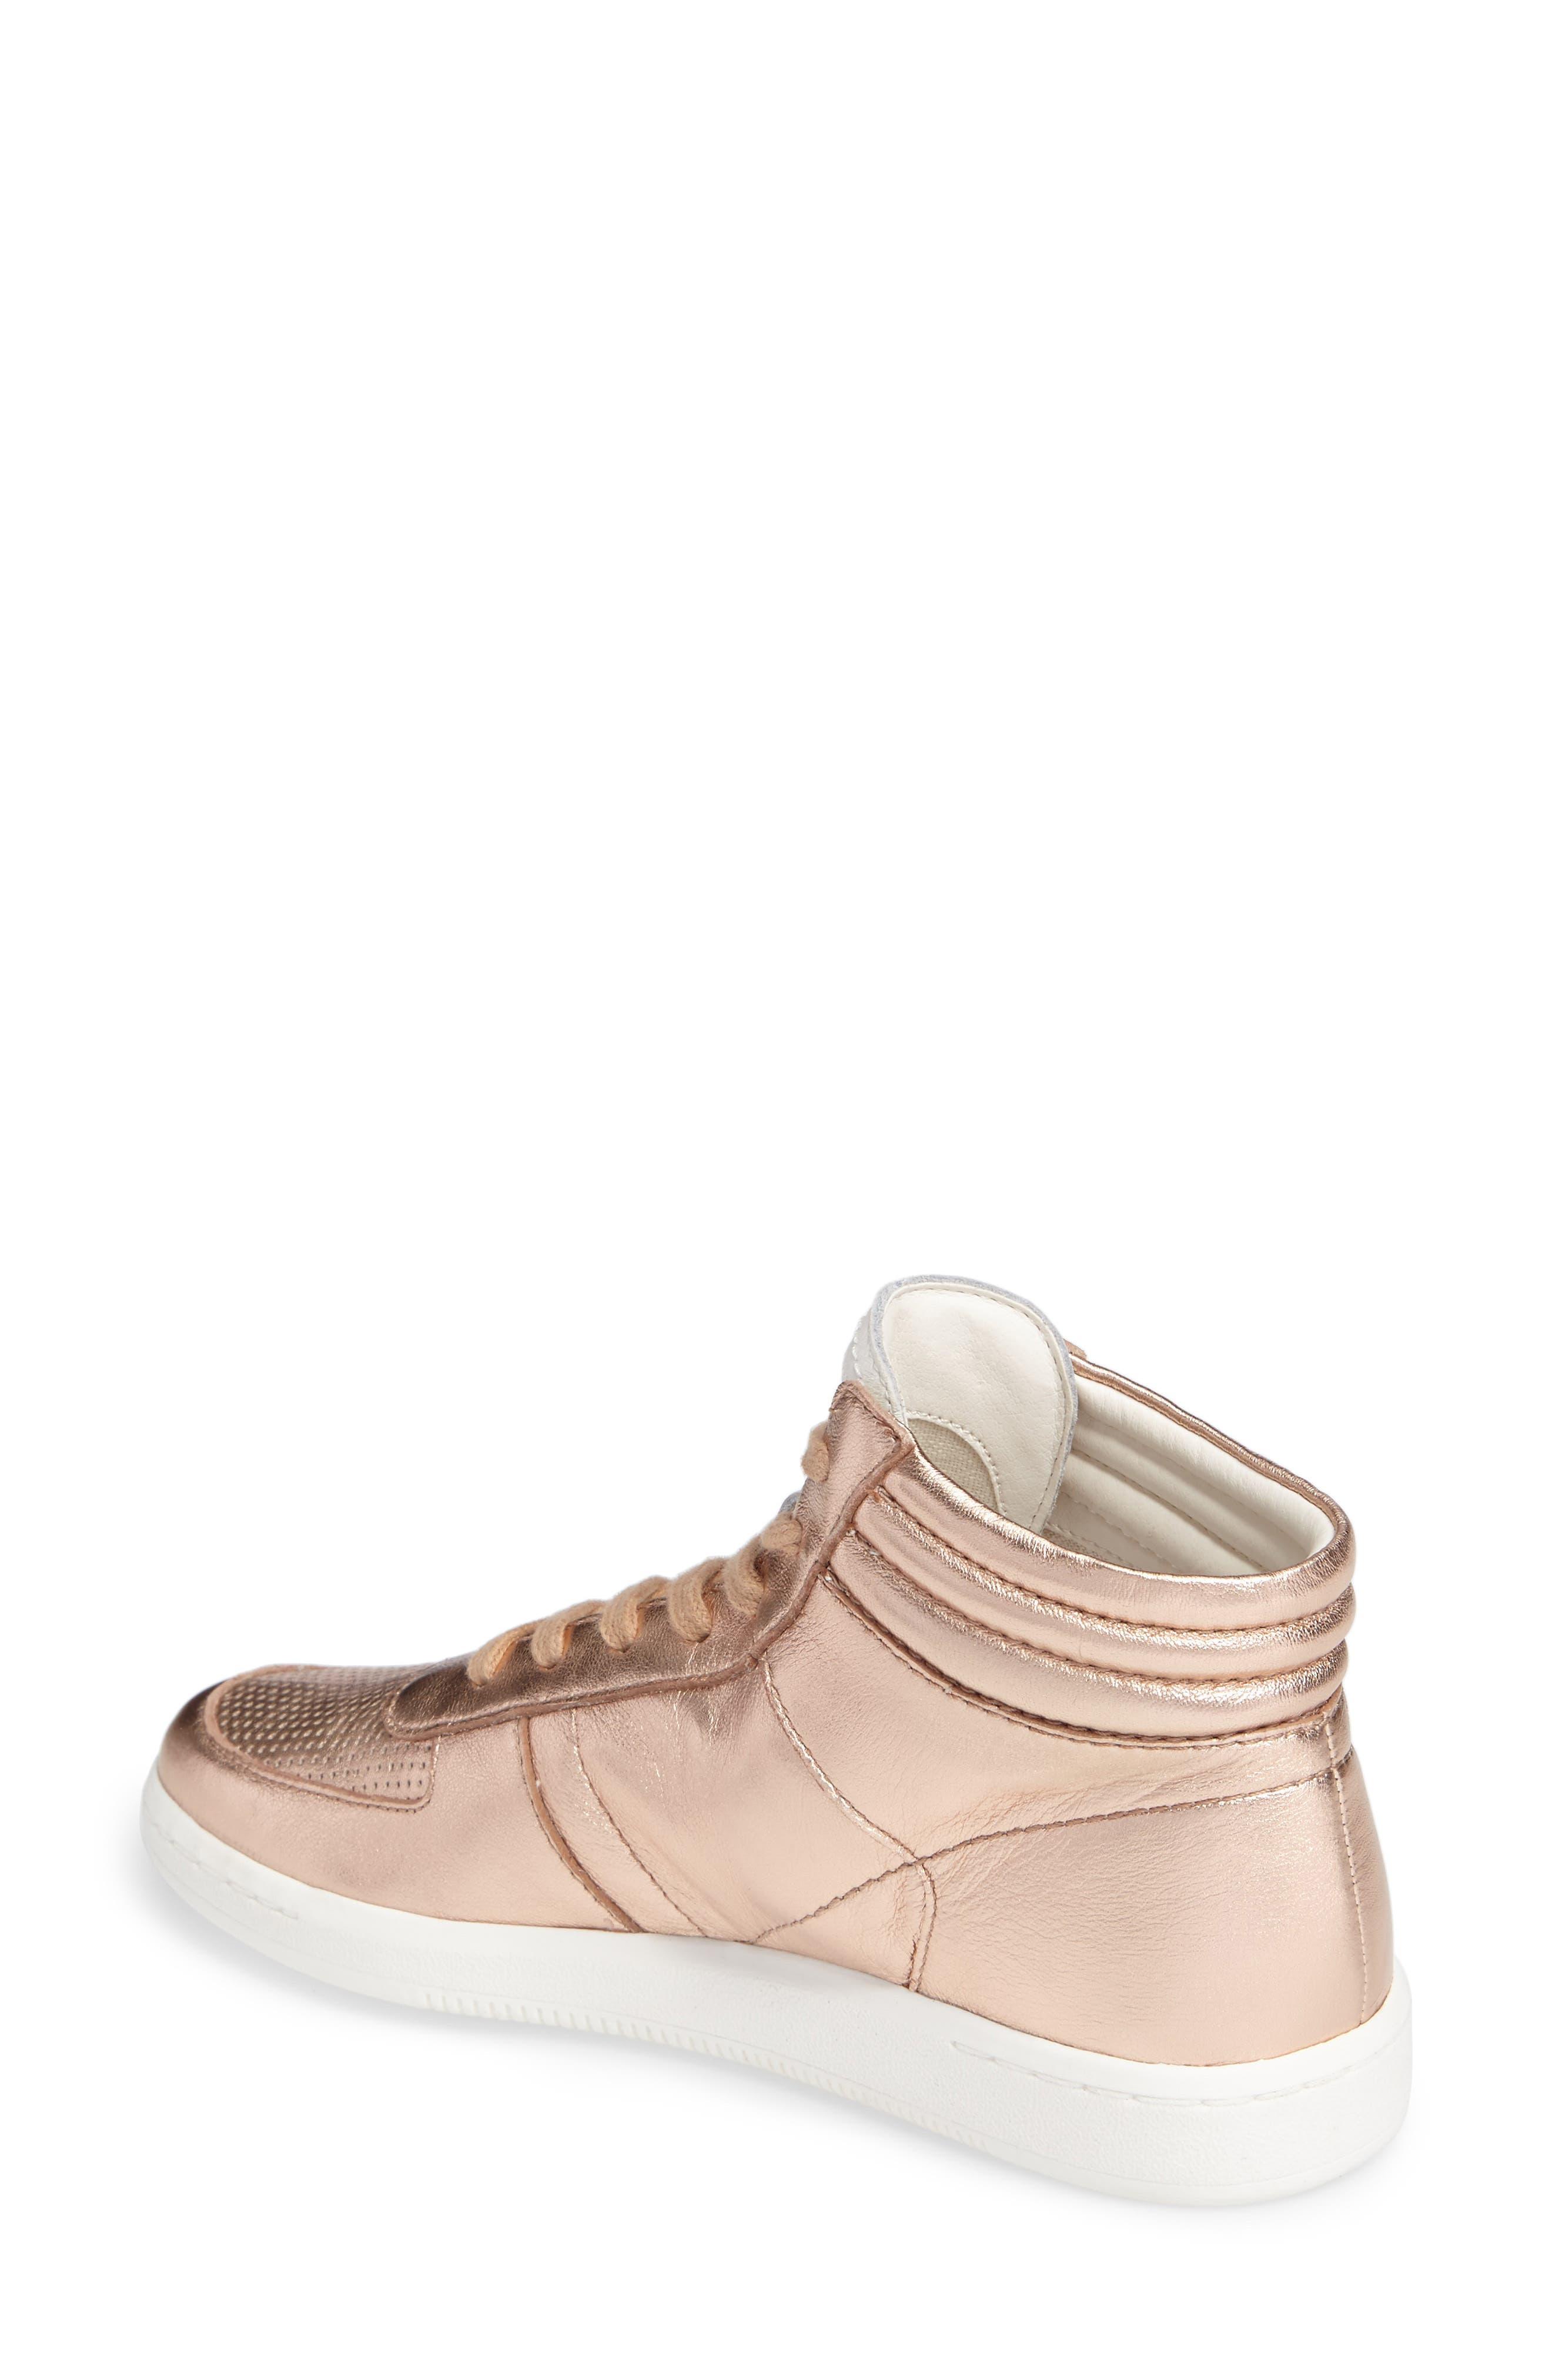 Nate High Top Sneaker,                             Alternate thumbnail 2, color,